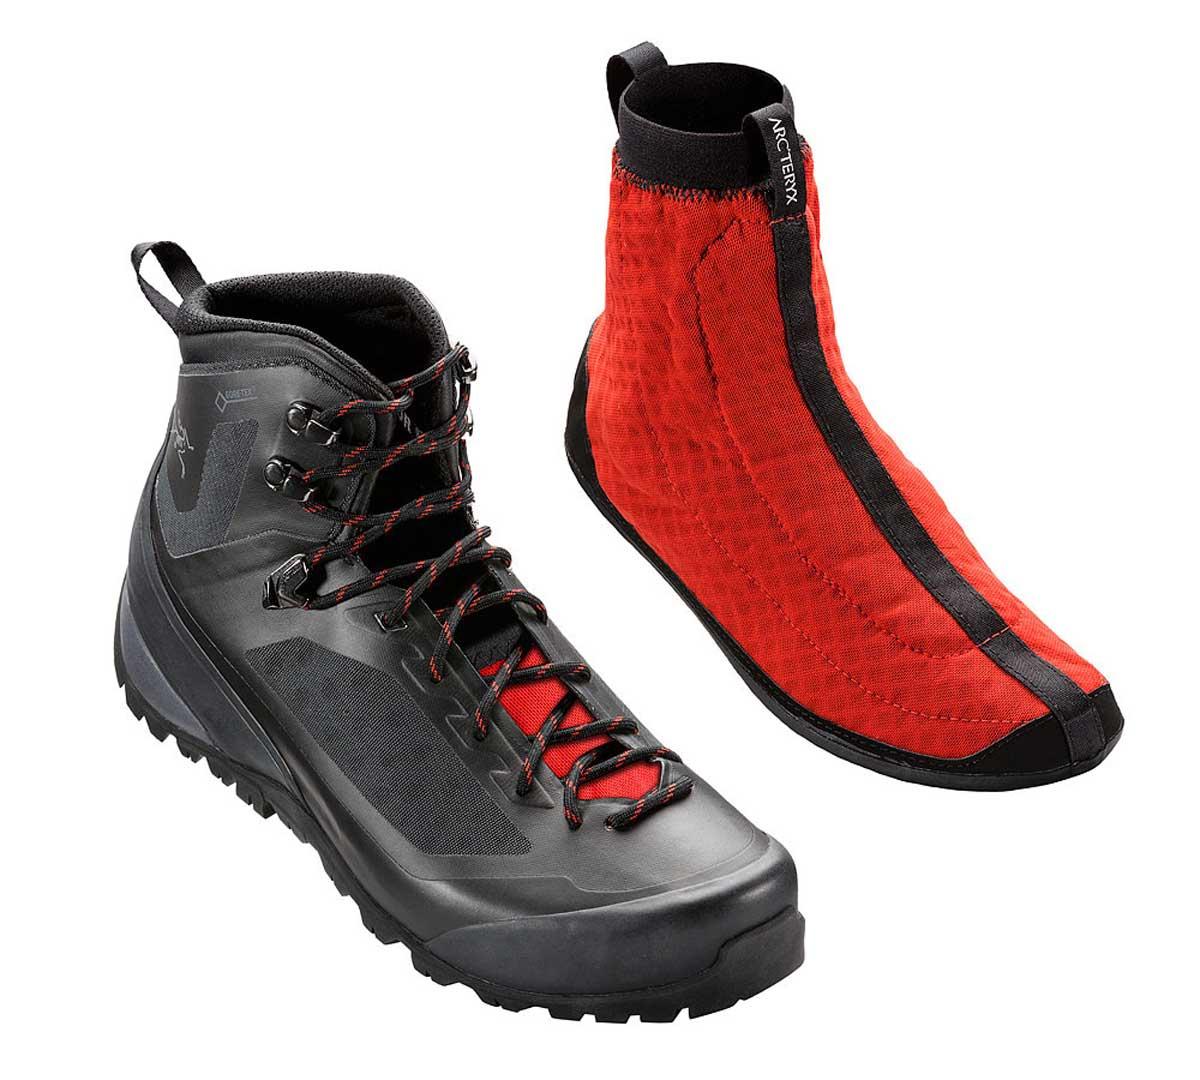 2016-08-22-Bora-Mid-GTX-Hiking-Boot-Arcteryx.jpg